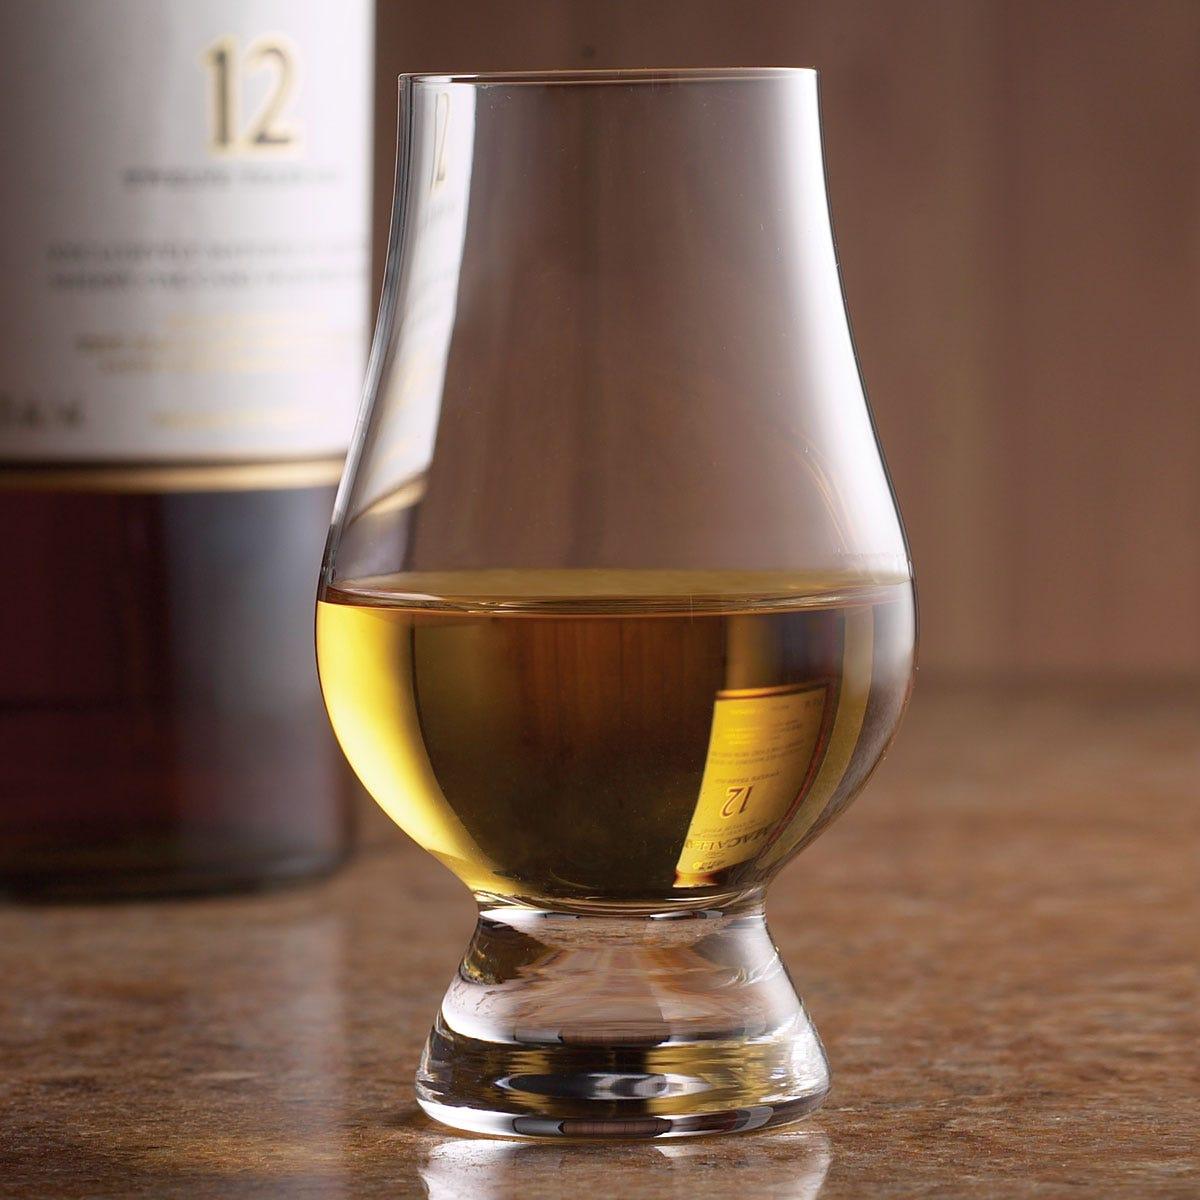 glencairn whiskey glasses set of 2 from sporty 39 s pilot shop. Black Bedroom Furniture Sets. Home Design Ideas